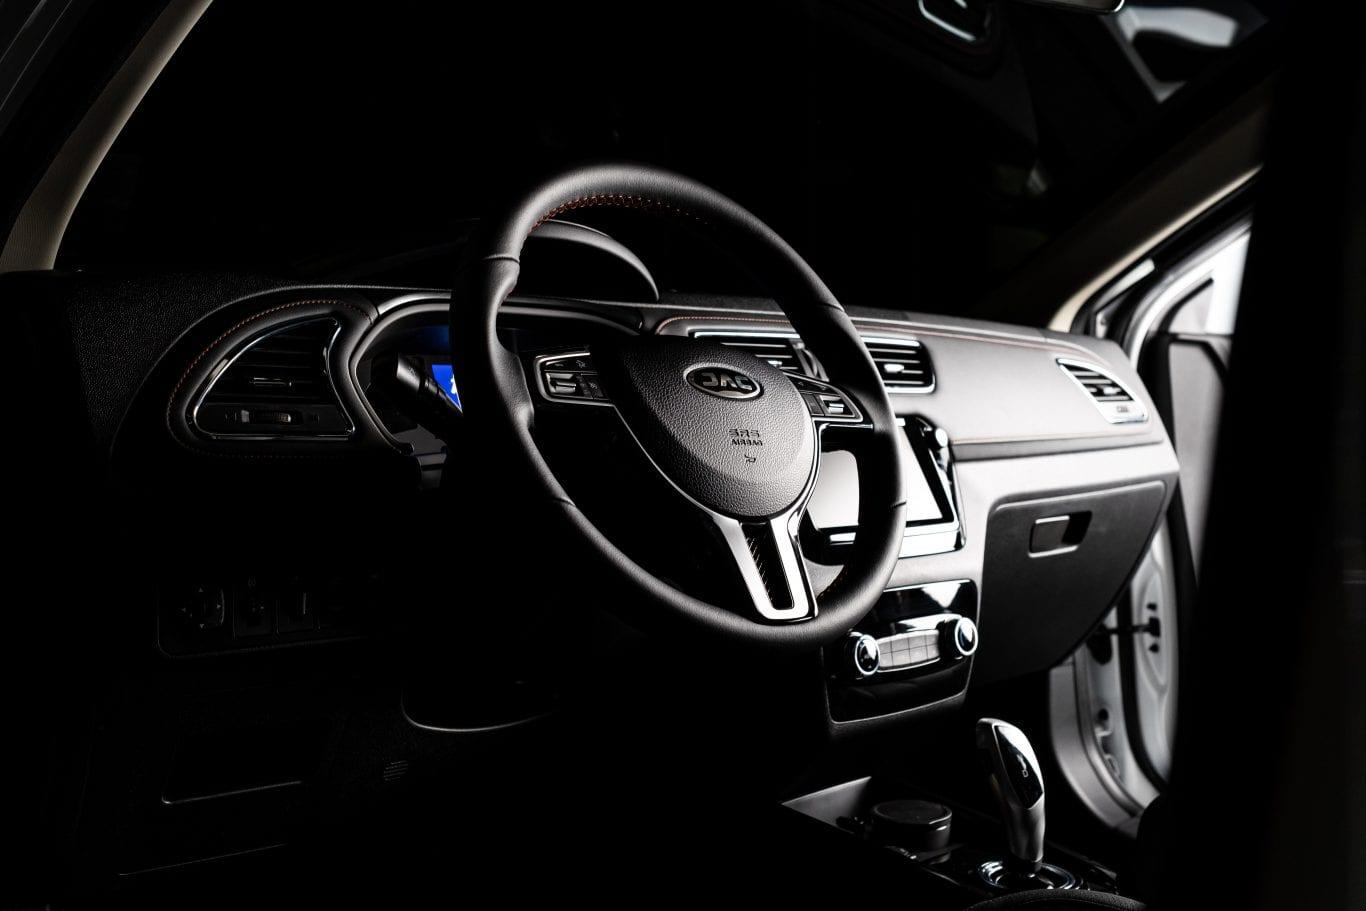 JAC – Auto Kunz ist offiziell neuer Generalimporteur - Auto Kunz AG 6